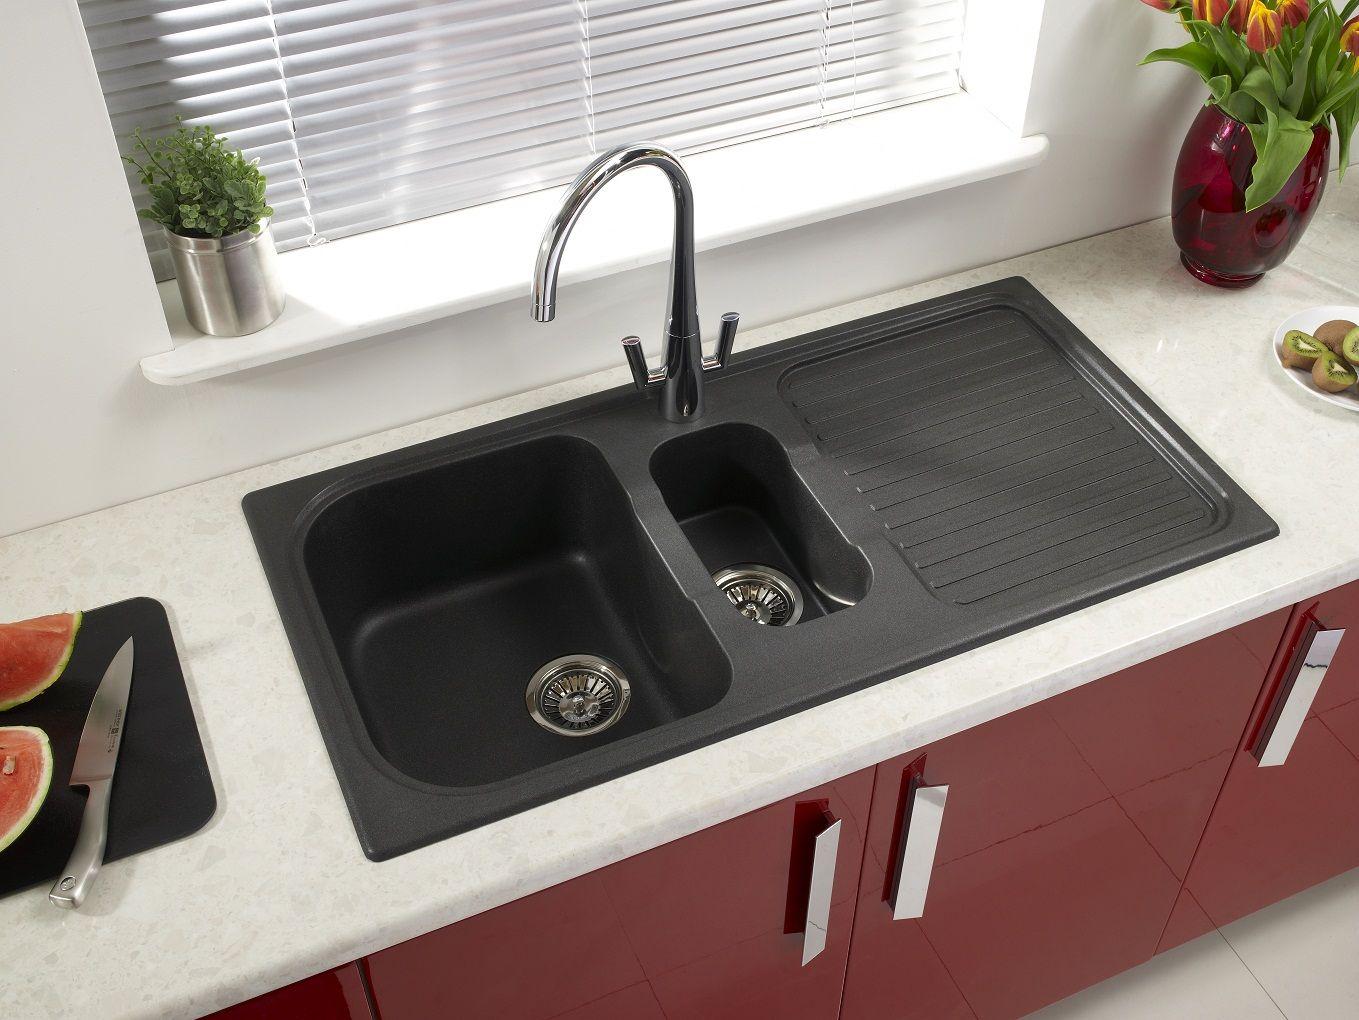 Tuscan Sinks Granite Black 1 5b Composite Kitchen Sinks Black